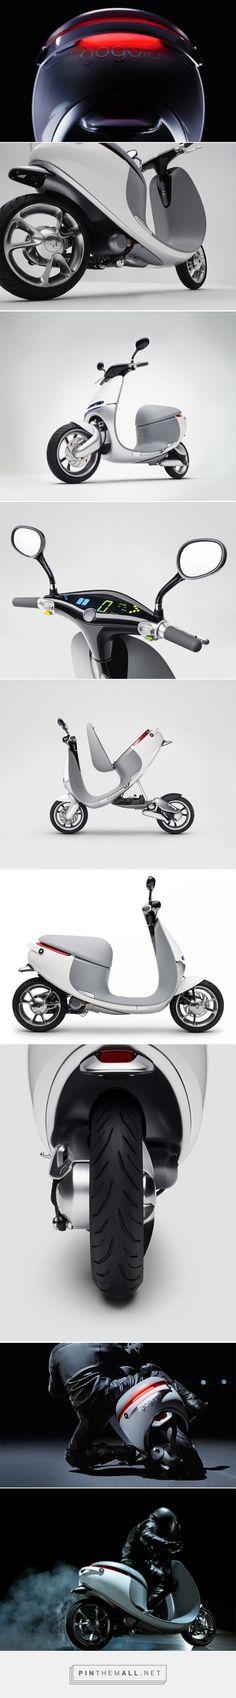 Gogoro Electric Smartscooter – Fubiz Media - created via http://pinthemall.net